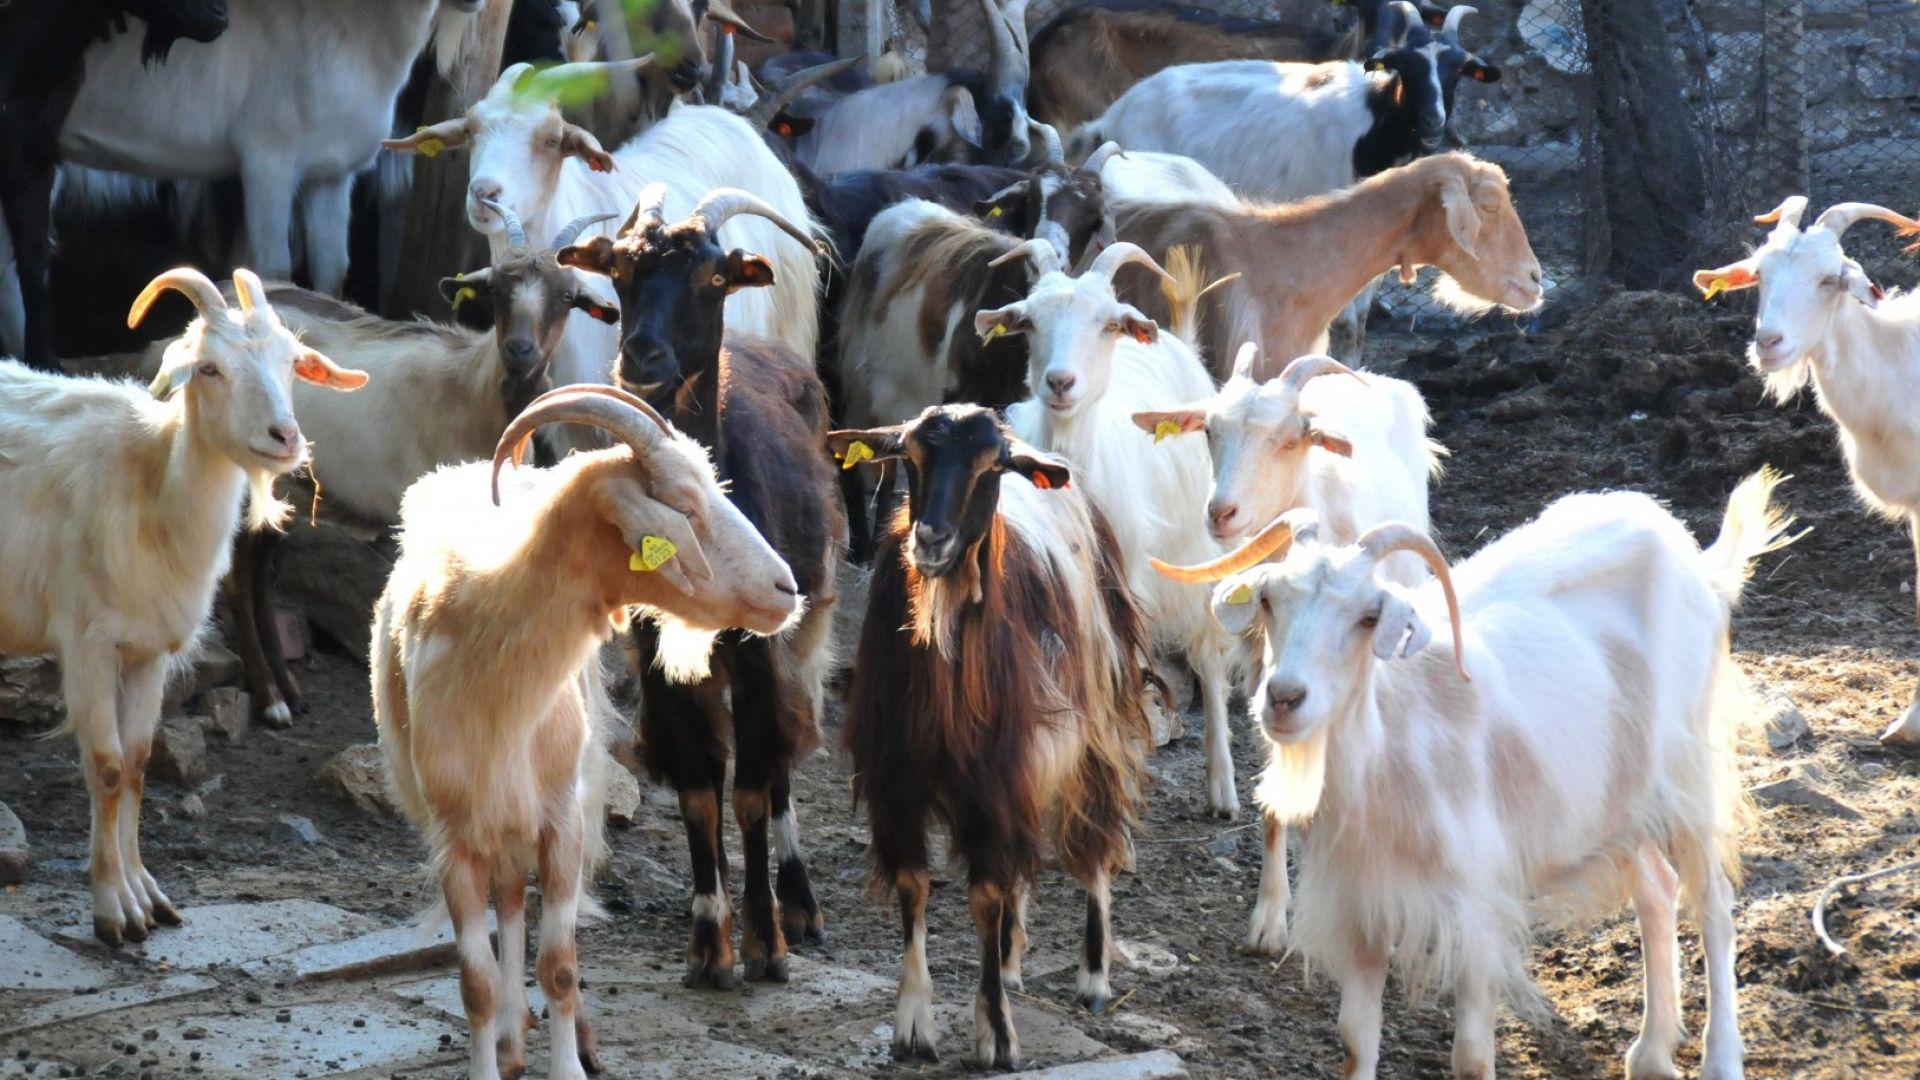 БАБХ преведе над 300 хил. лева като компенсации за убити животни